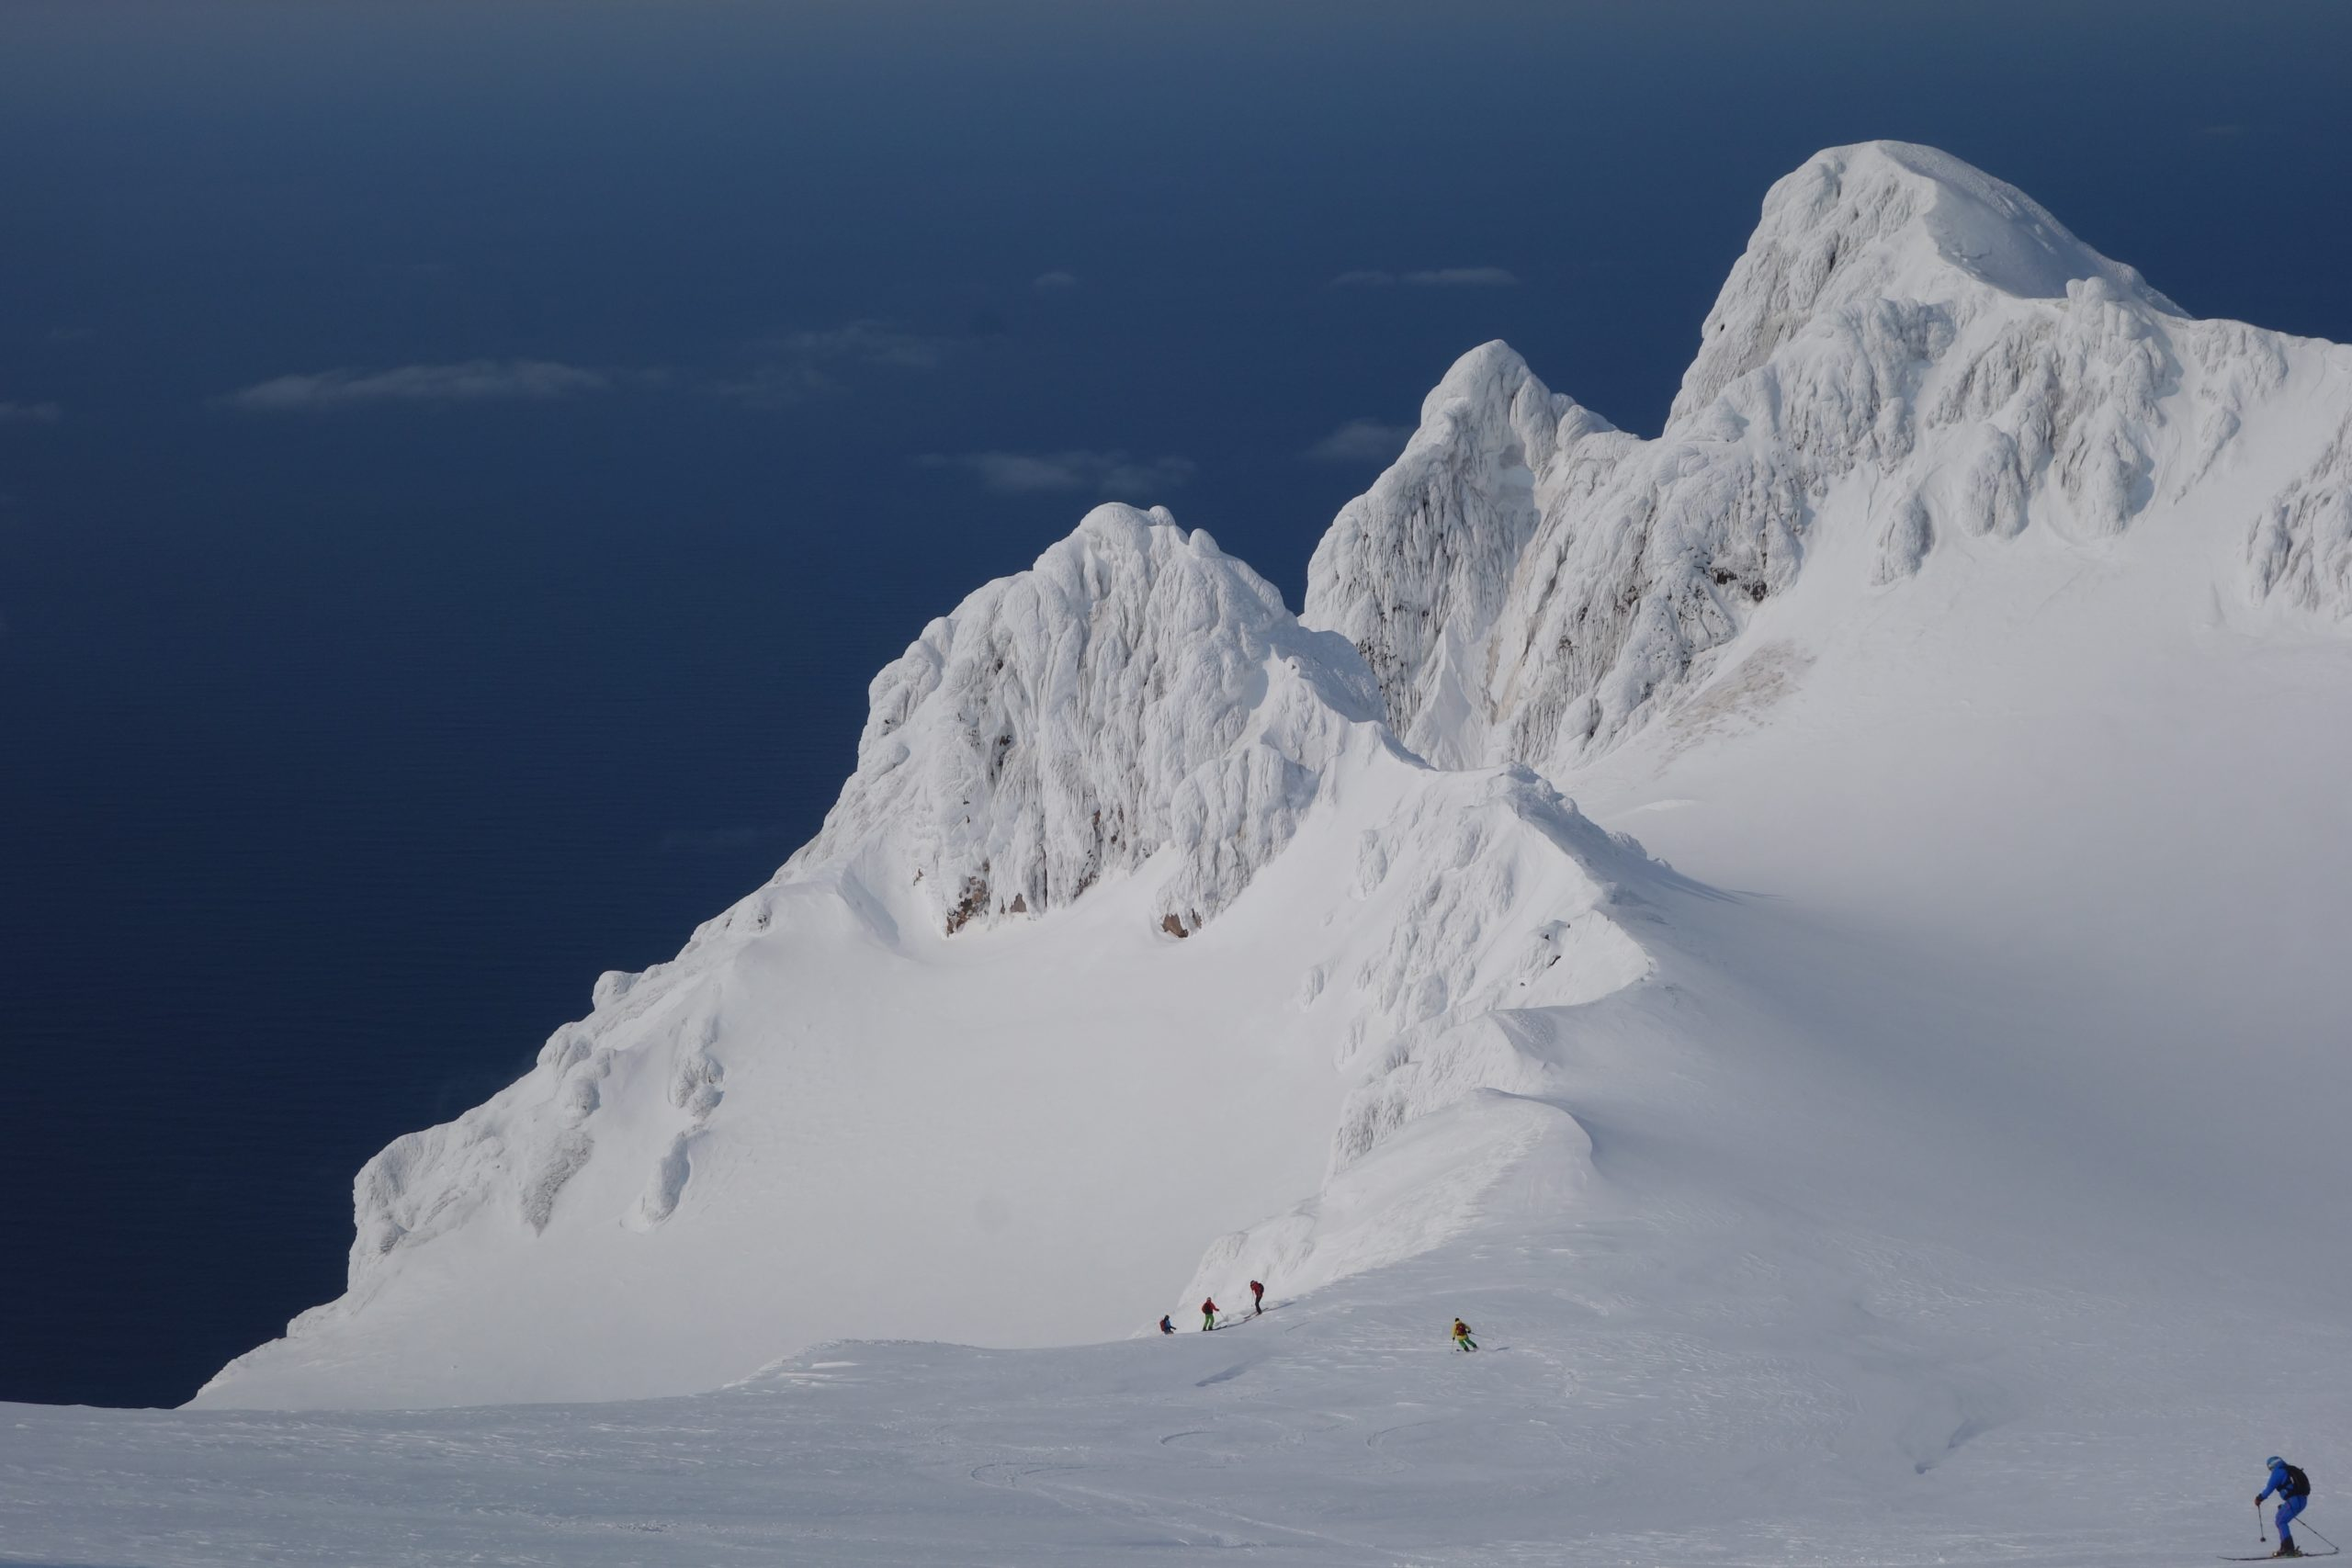 Tchoukotka-Kamchatka-La-Datcha-Heliski-Russia-3-scaled